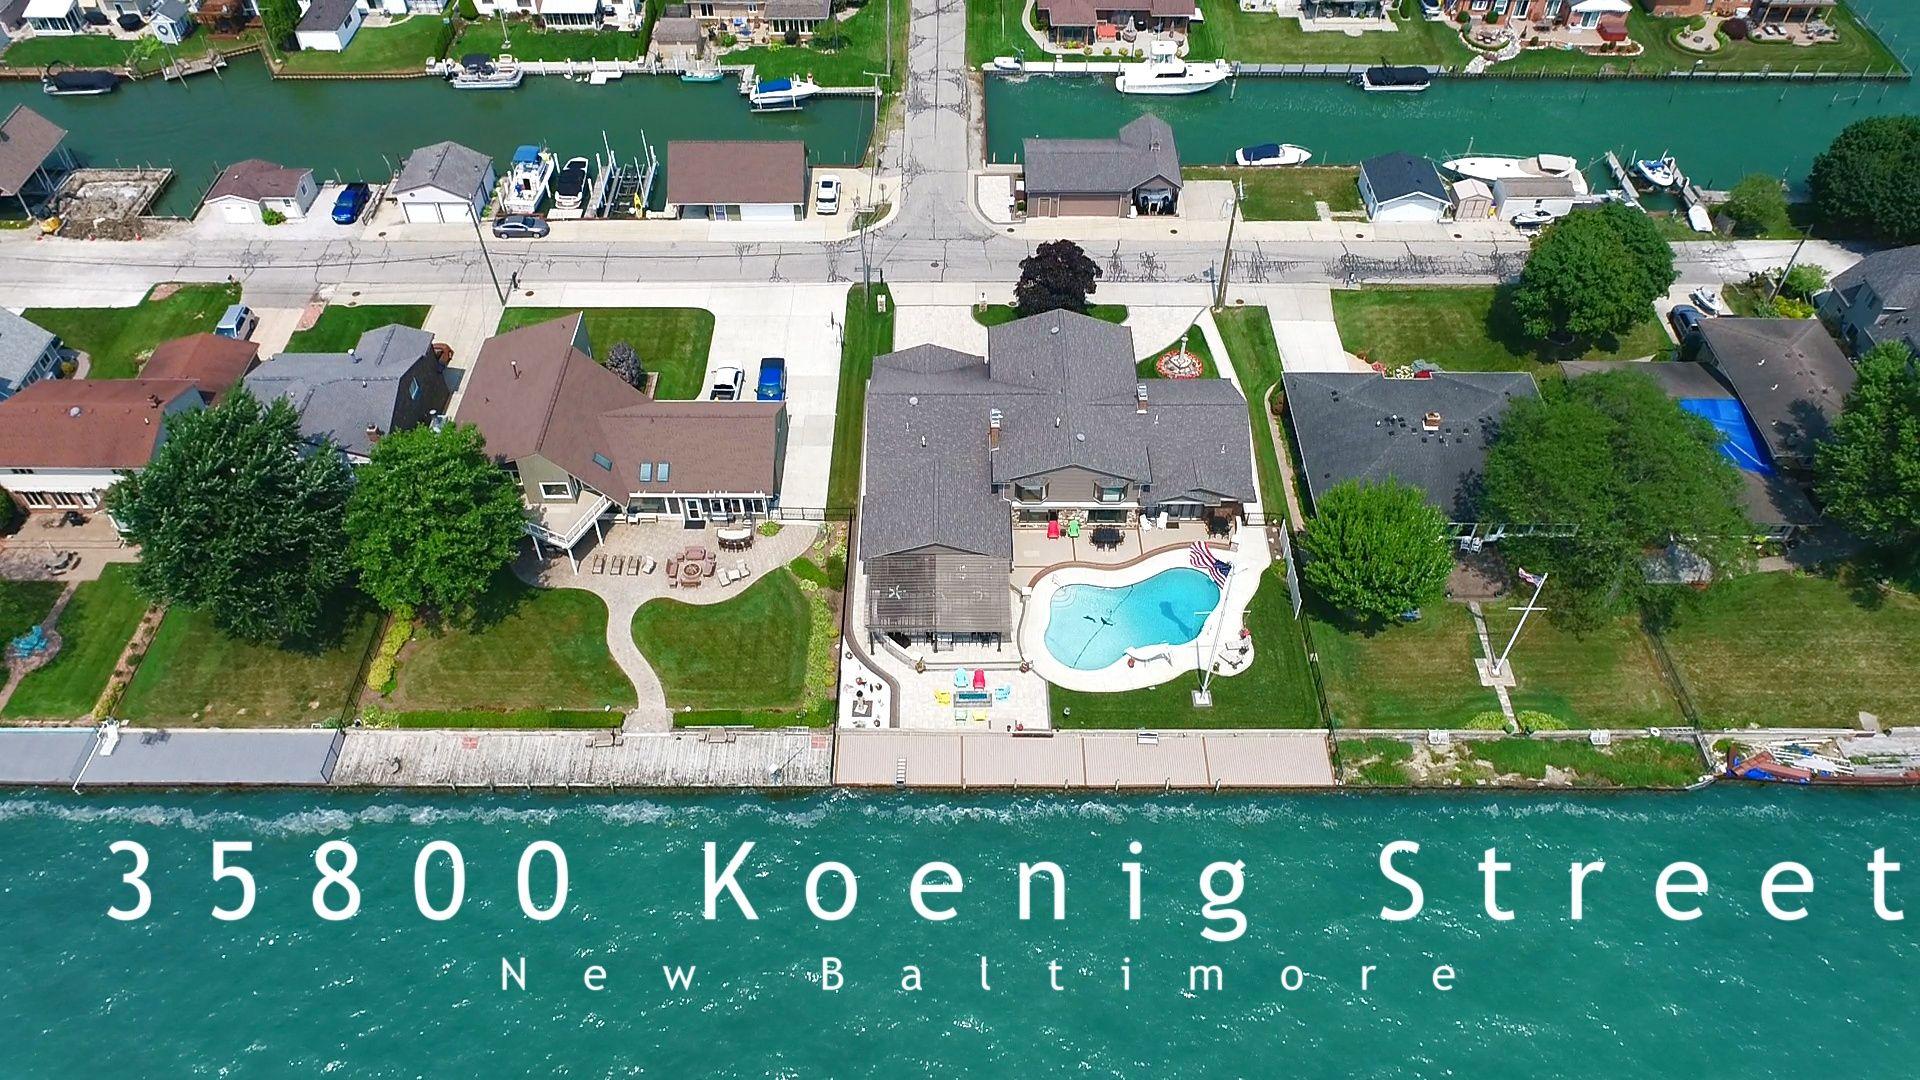 35800 Koenig St, New Baltimore, MI 48047, USA Photo 1